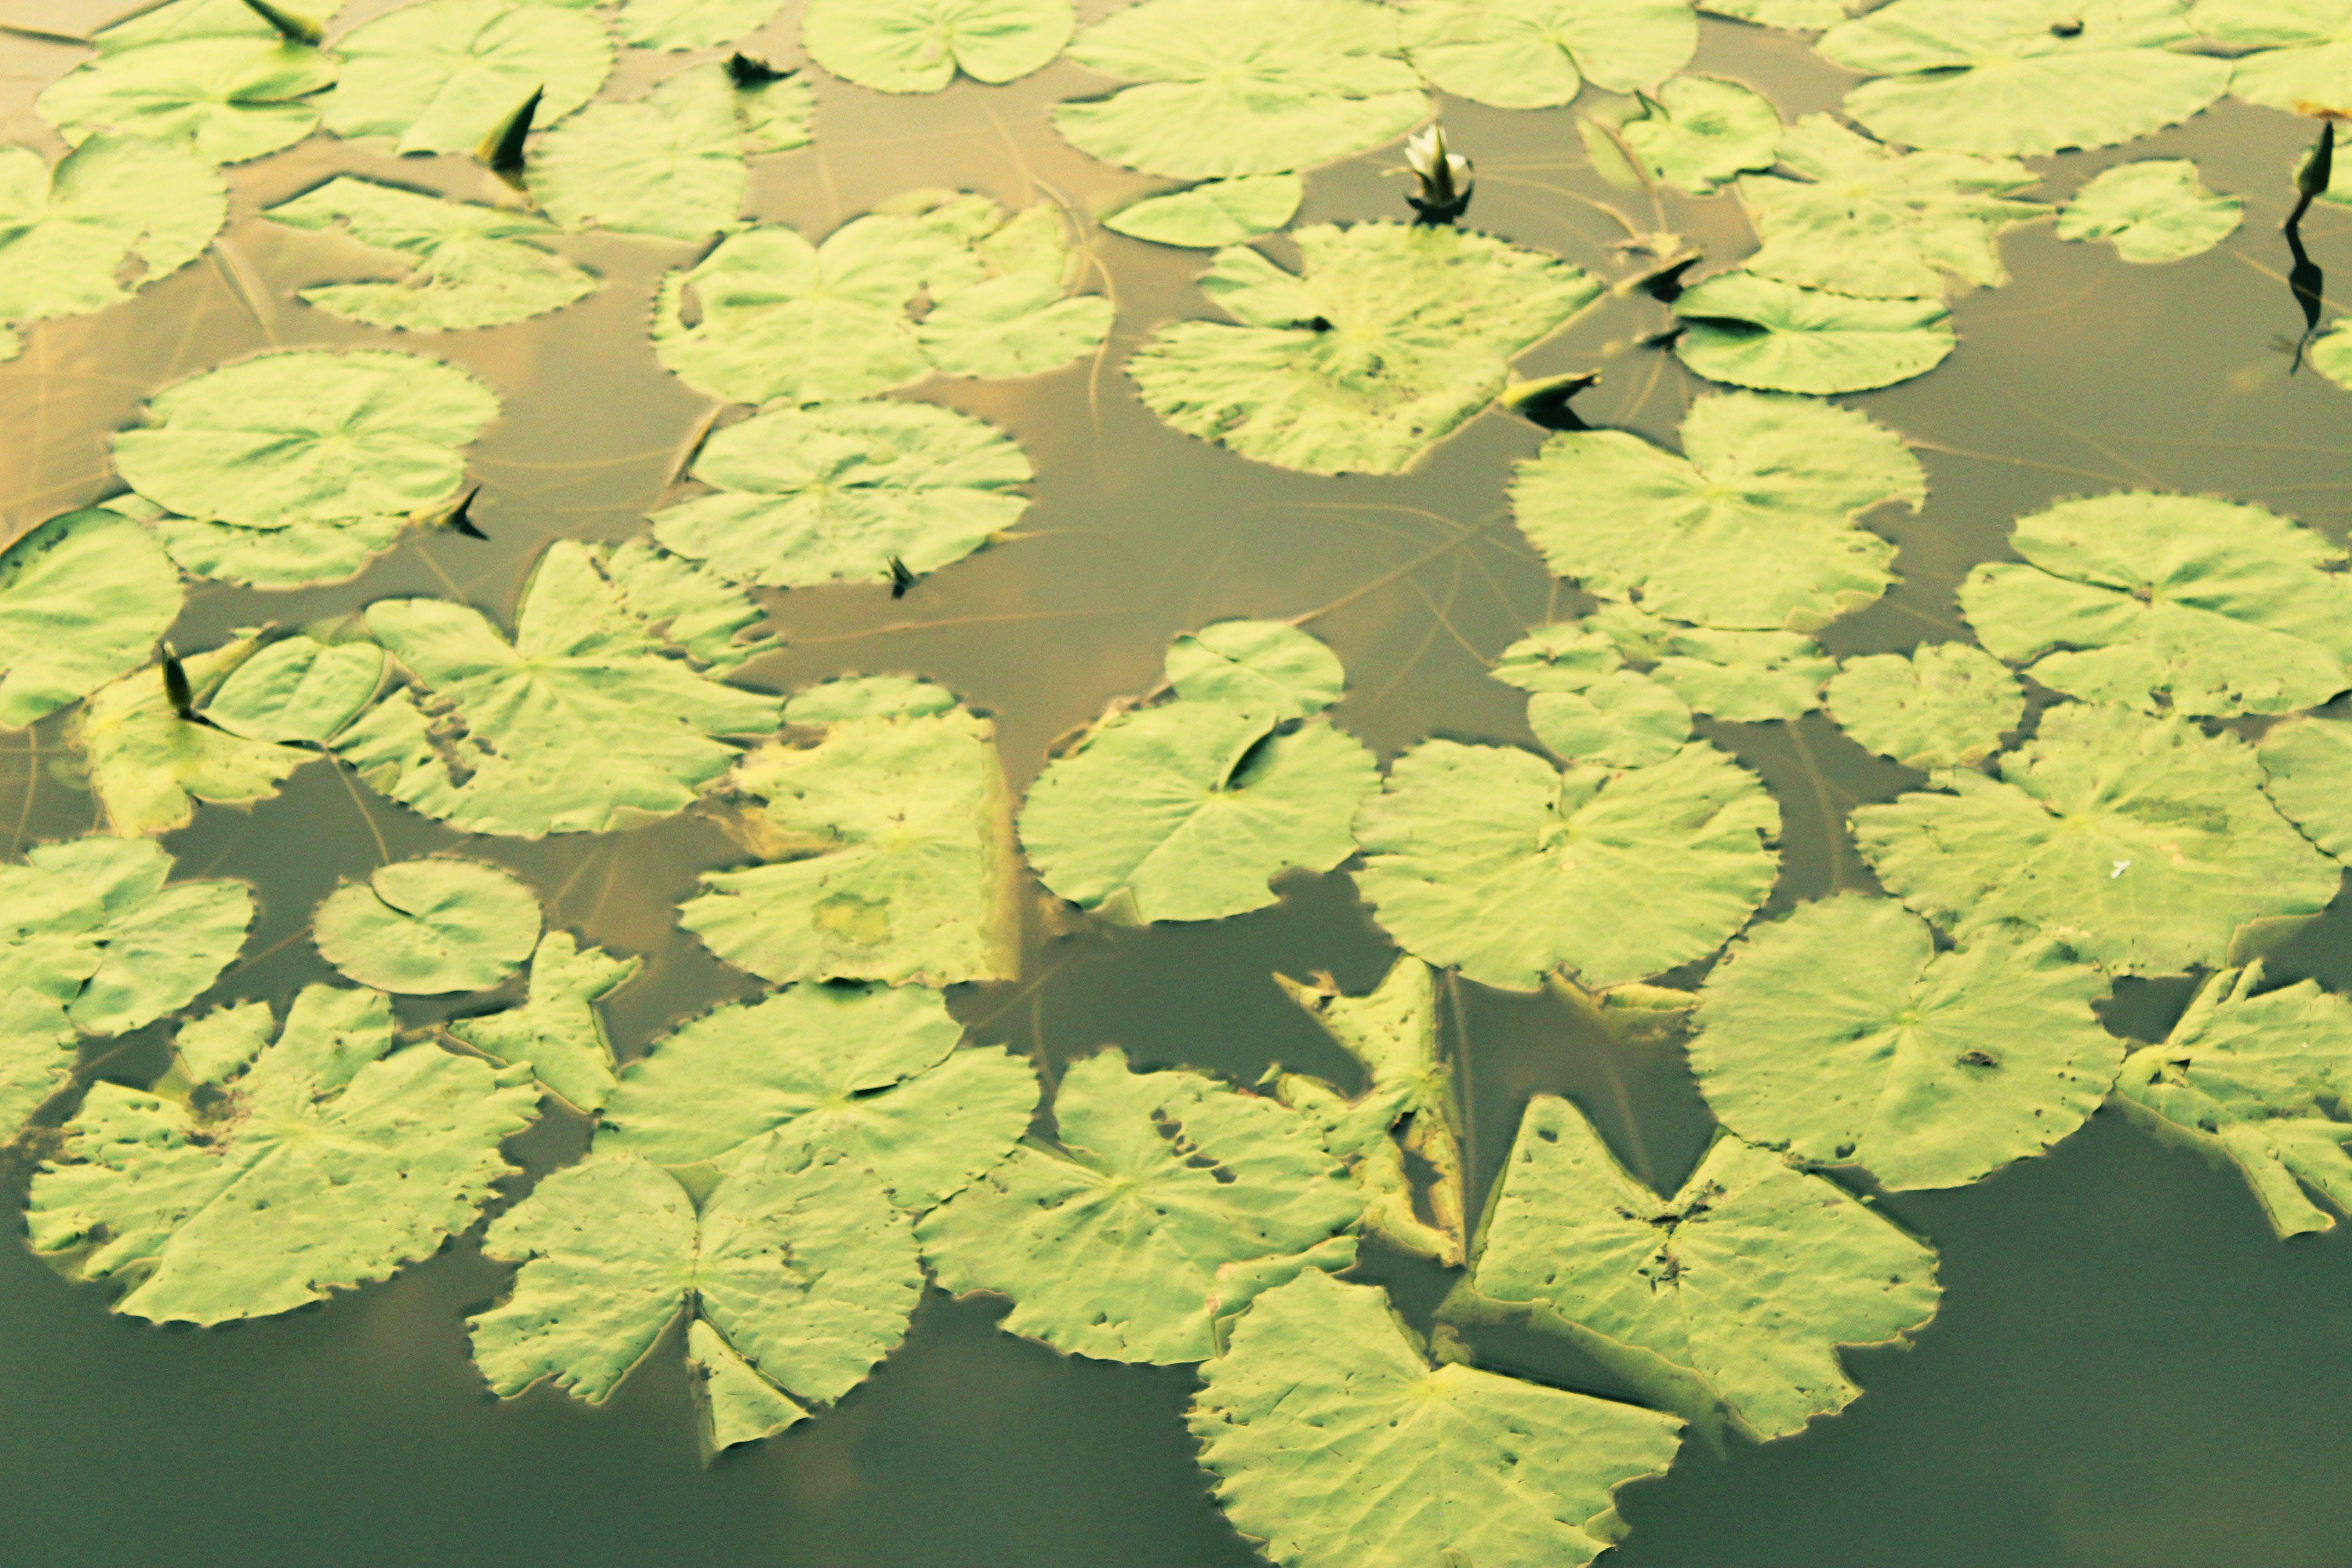 Kostenloses Stock Foto zu blätter im wasser, grüne blätter, lotusblättern, naturpark